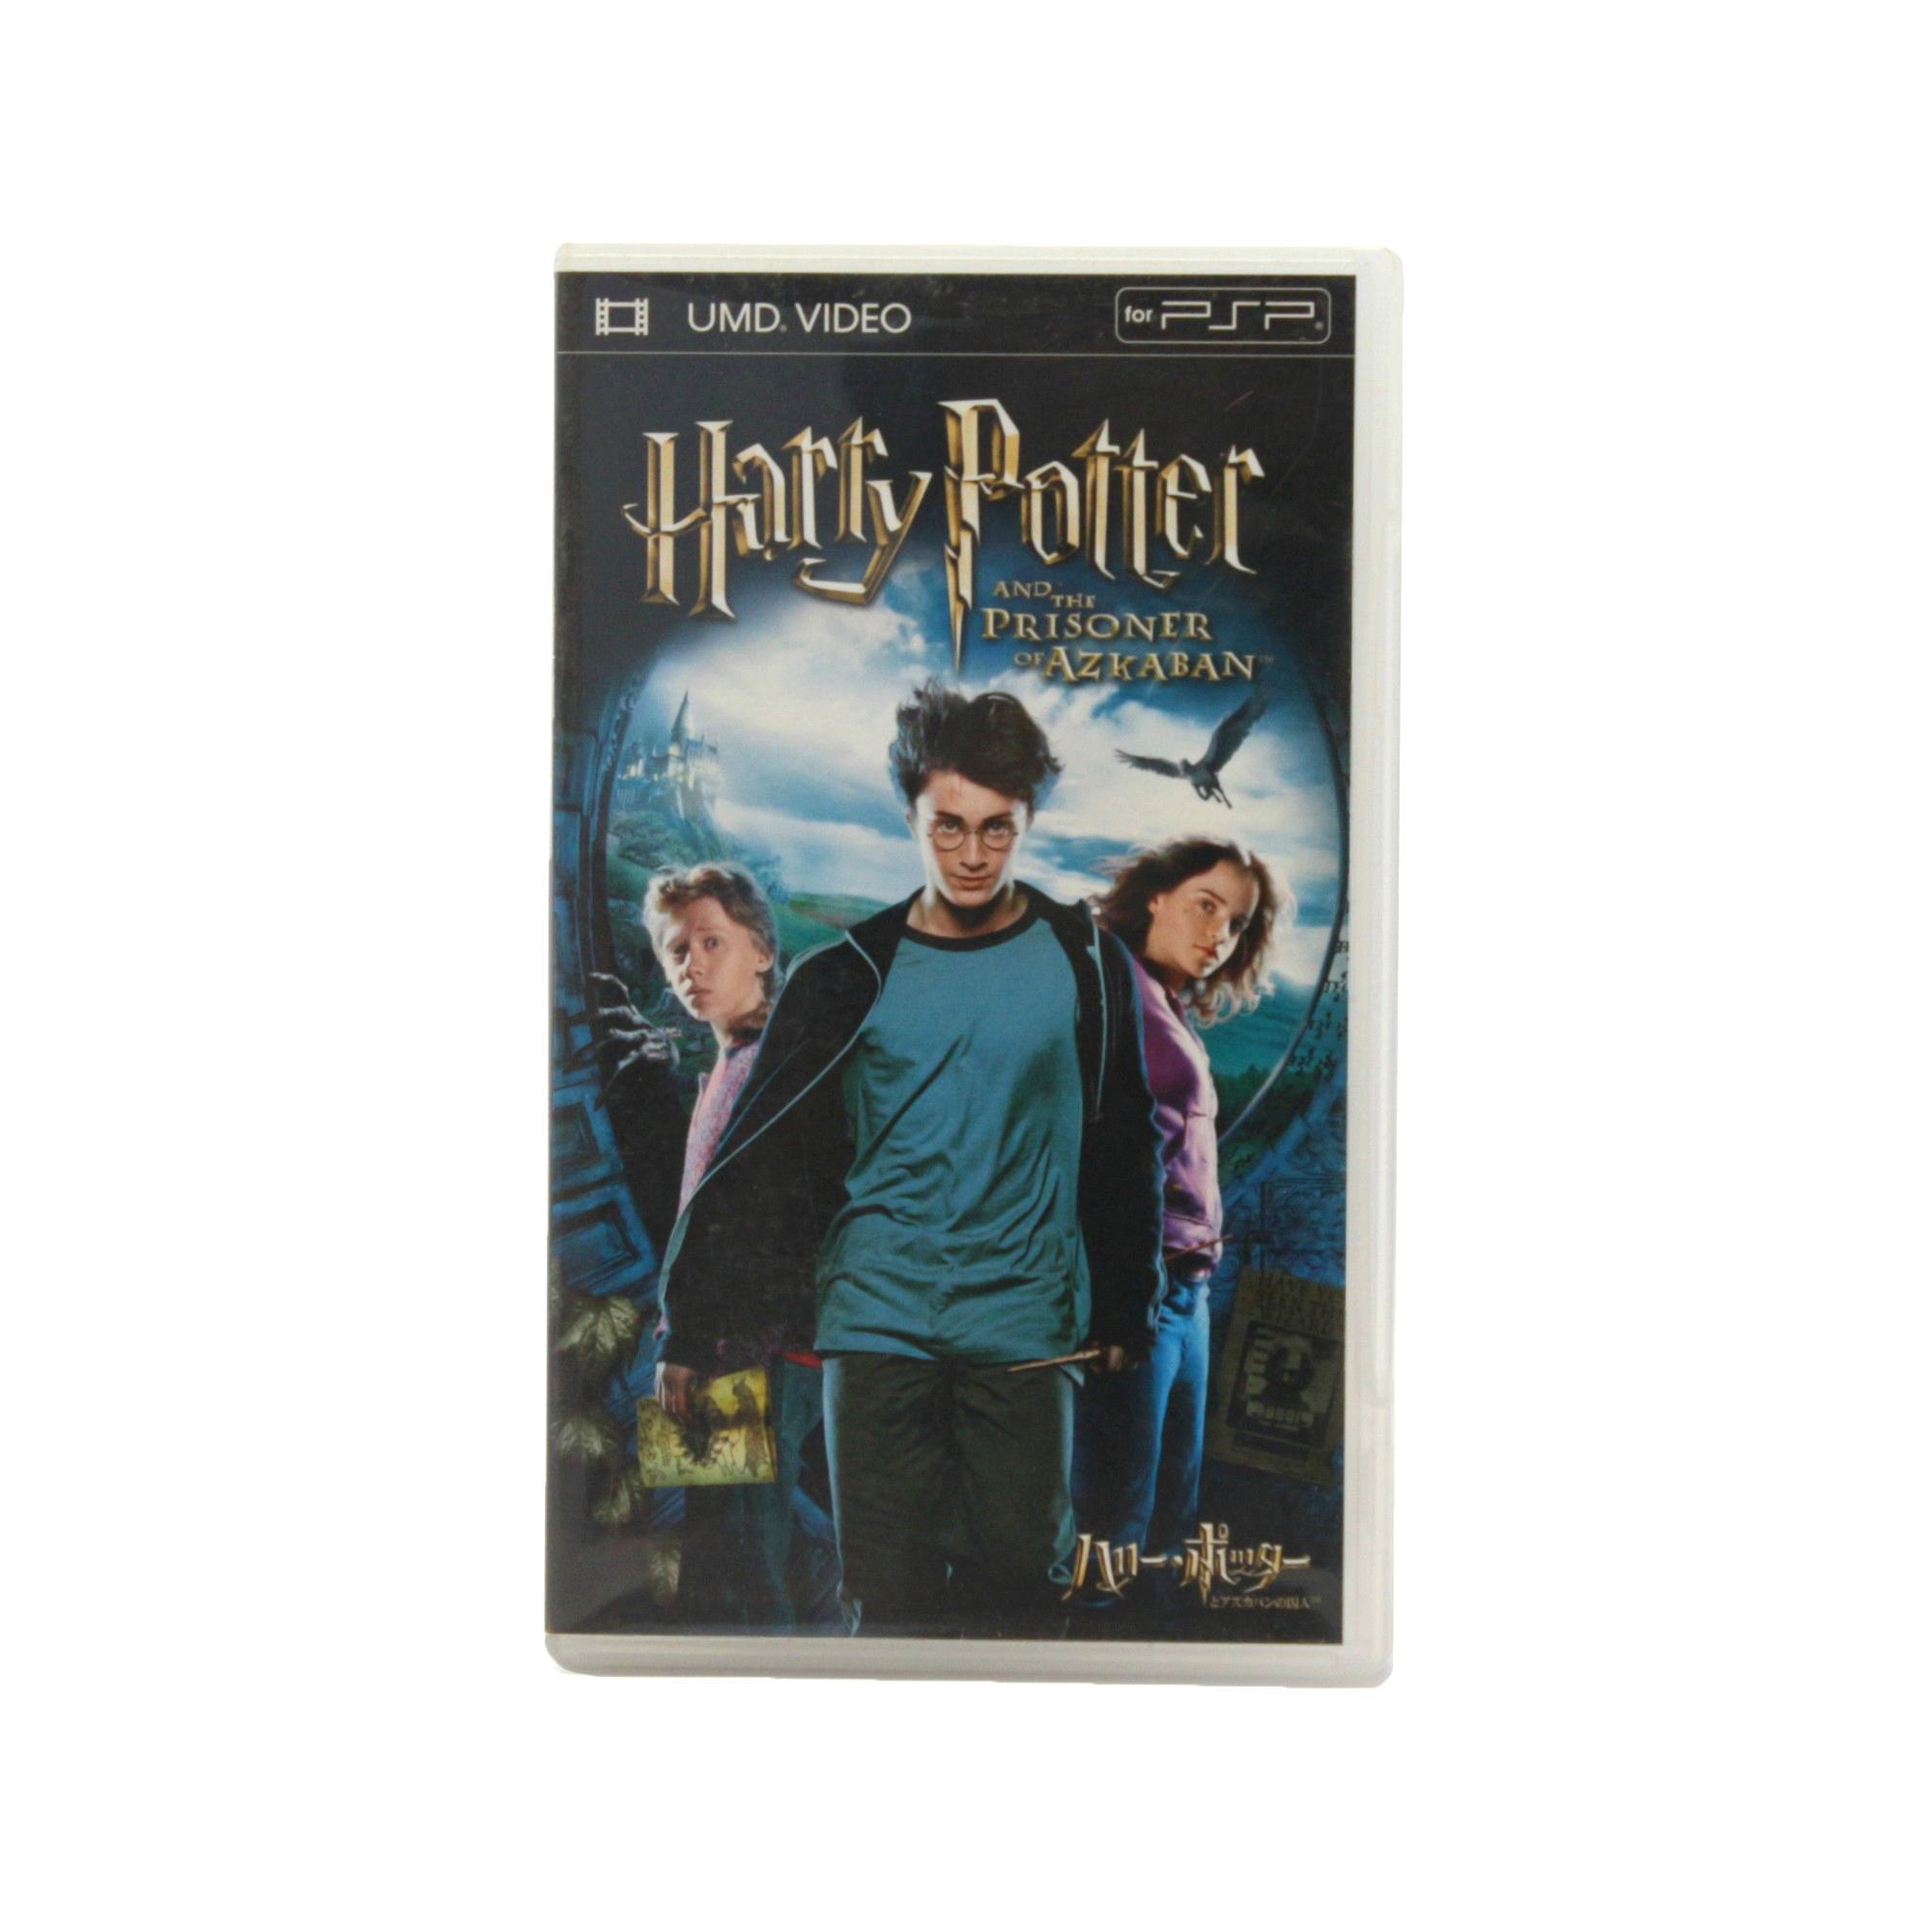 UMD Video - Harry Potter and the Prisoner of Azkaban